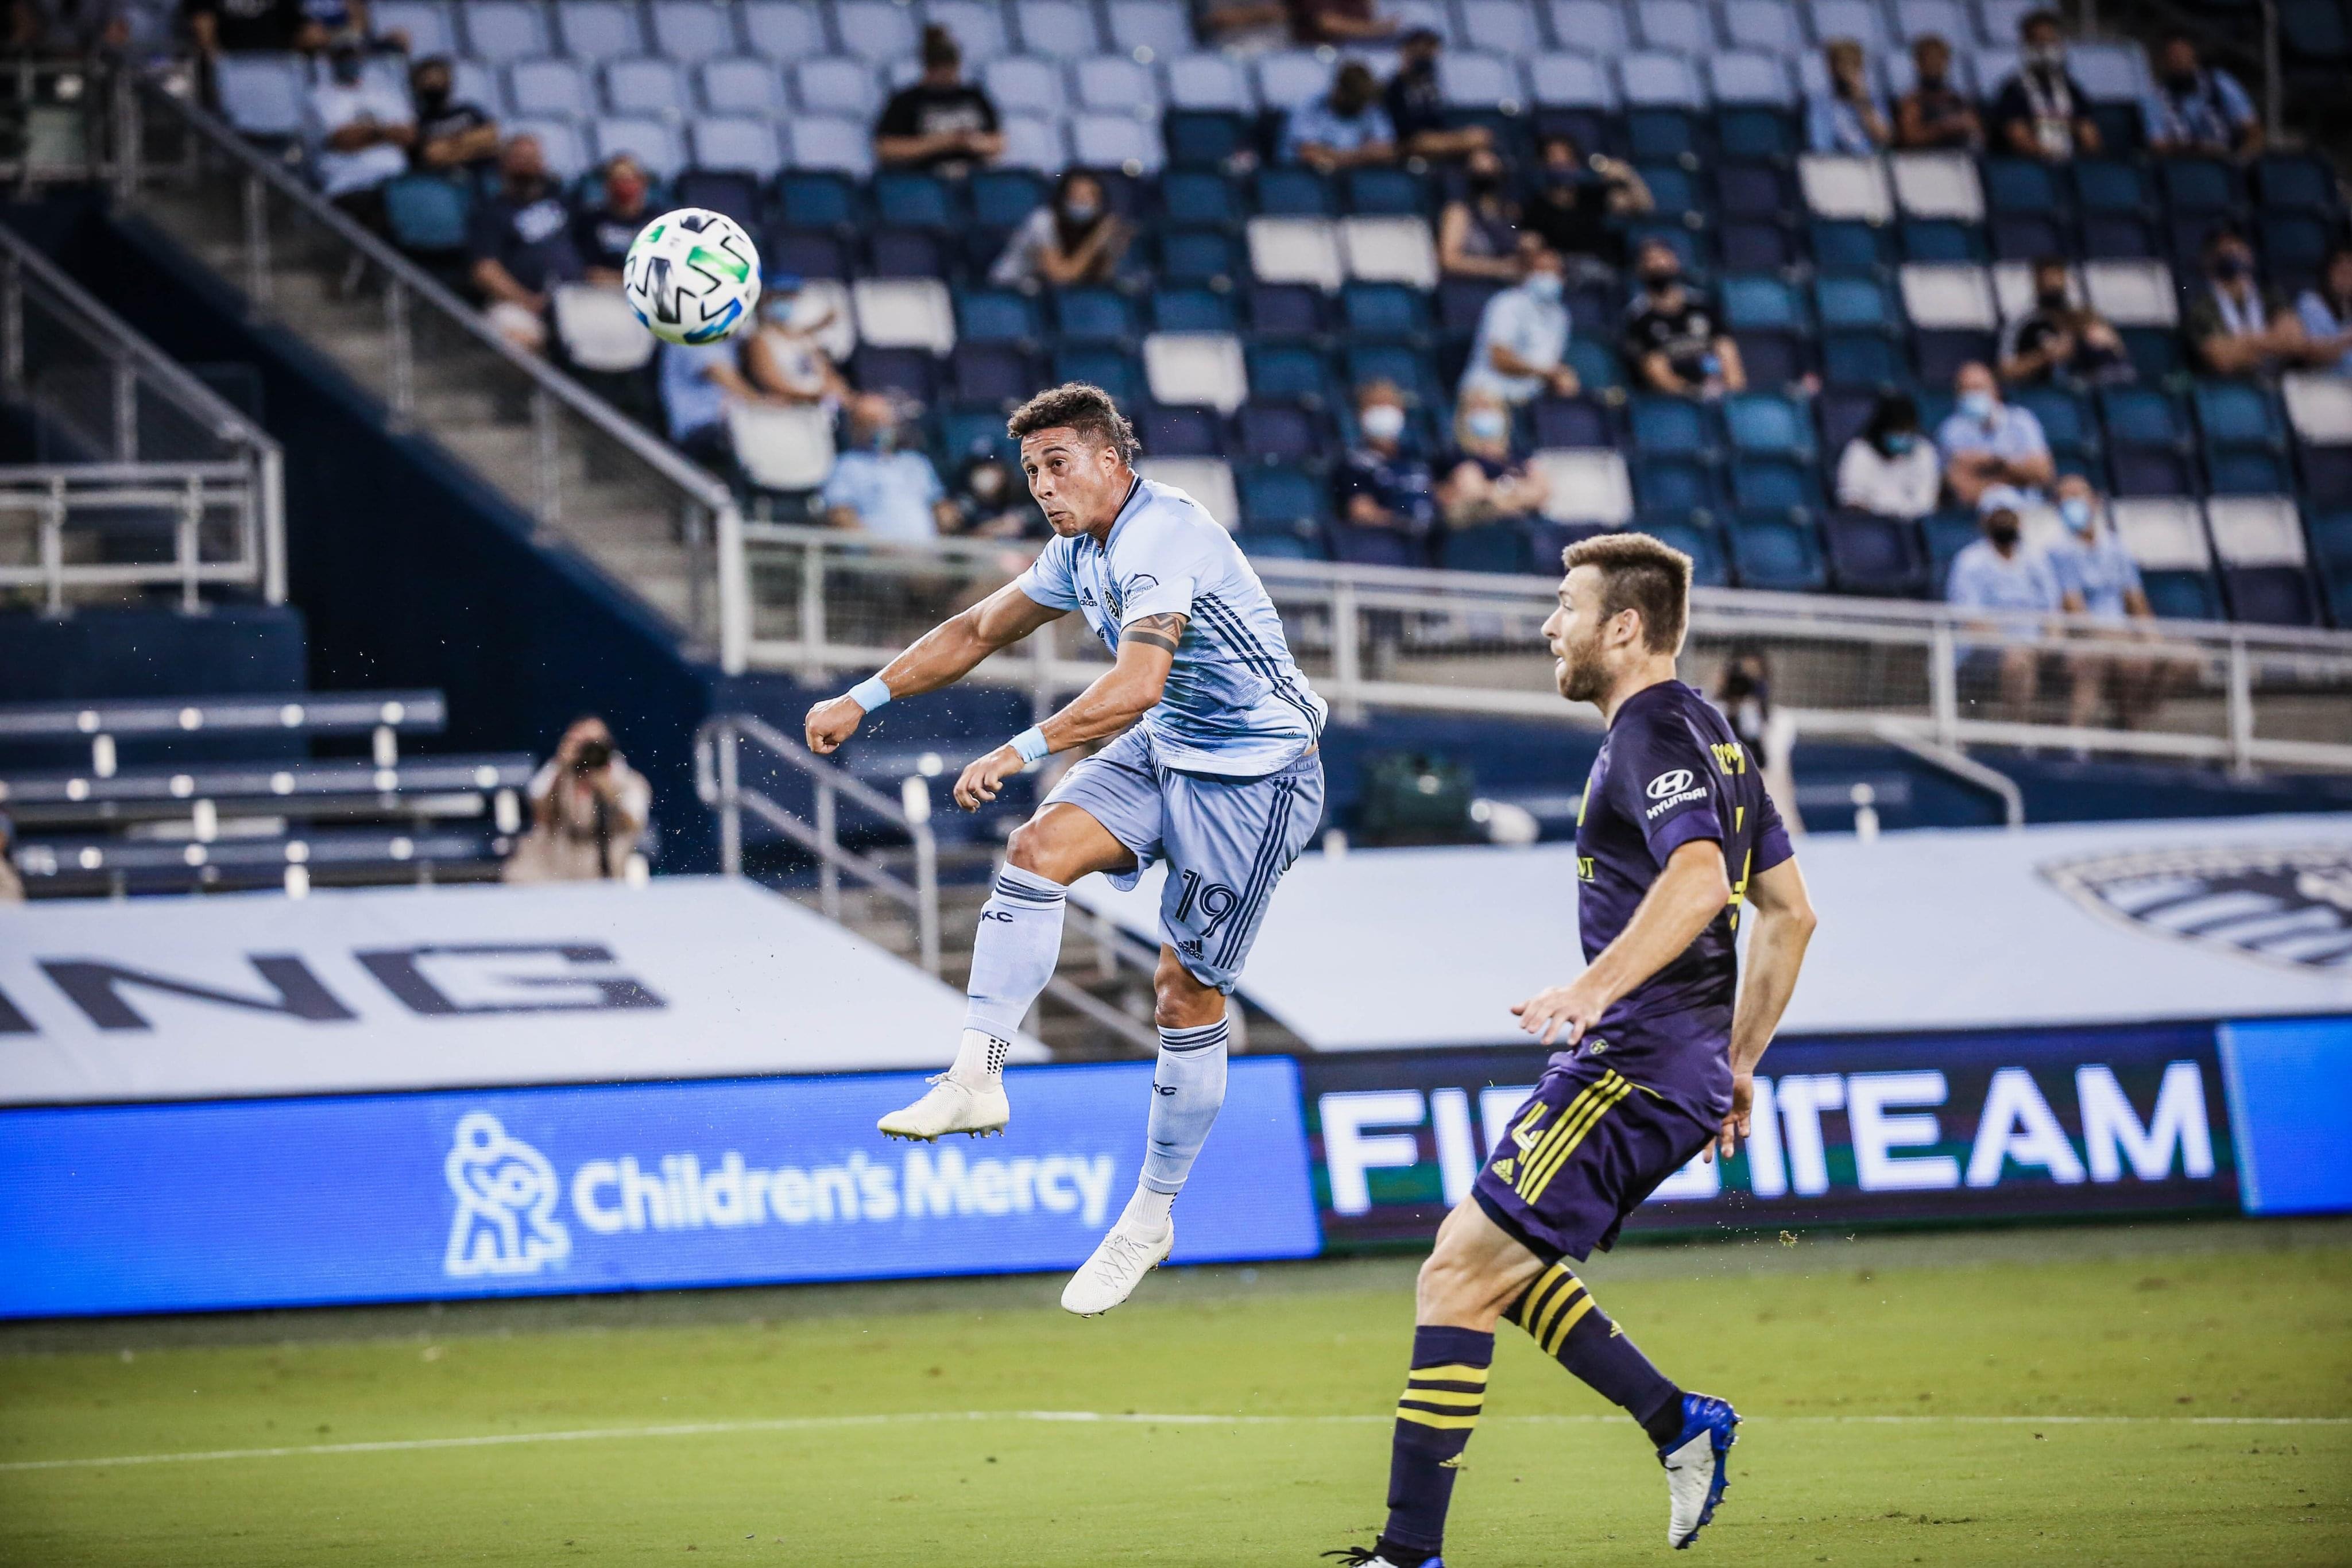 WATCH: Erik Hurtado scores jaw-dropping game winner in Sporting KC's 2-1 win over Nashville SC